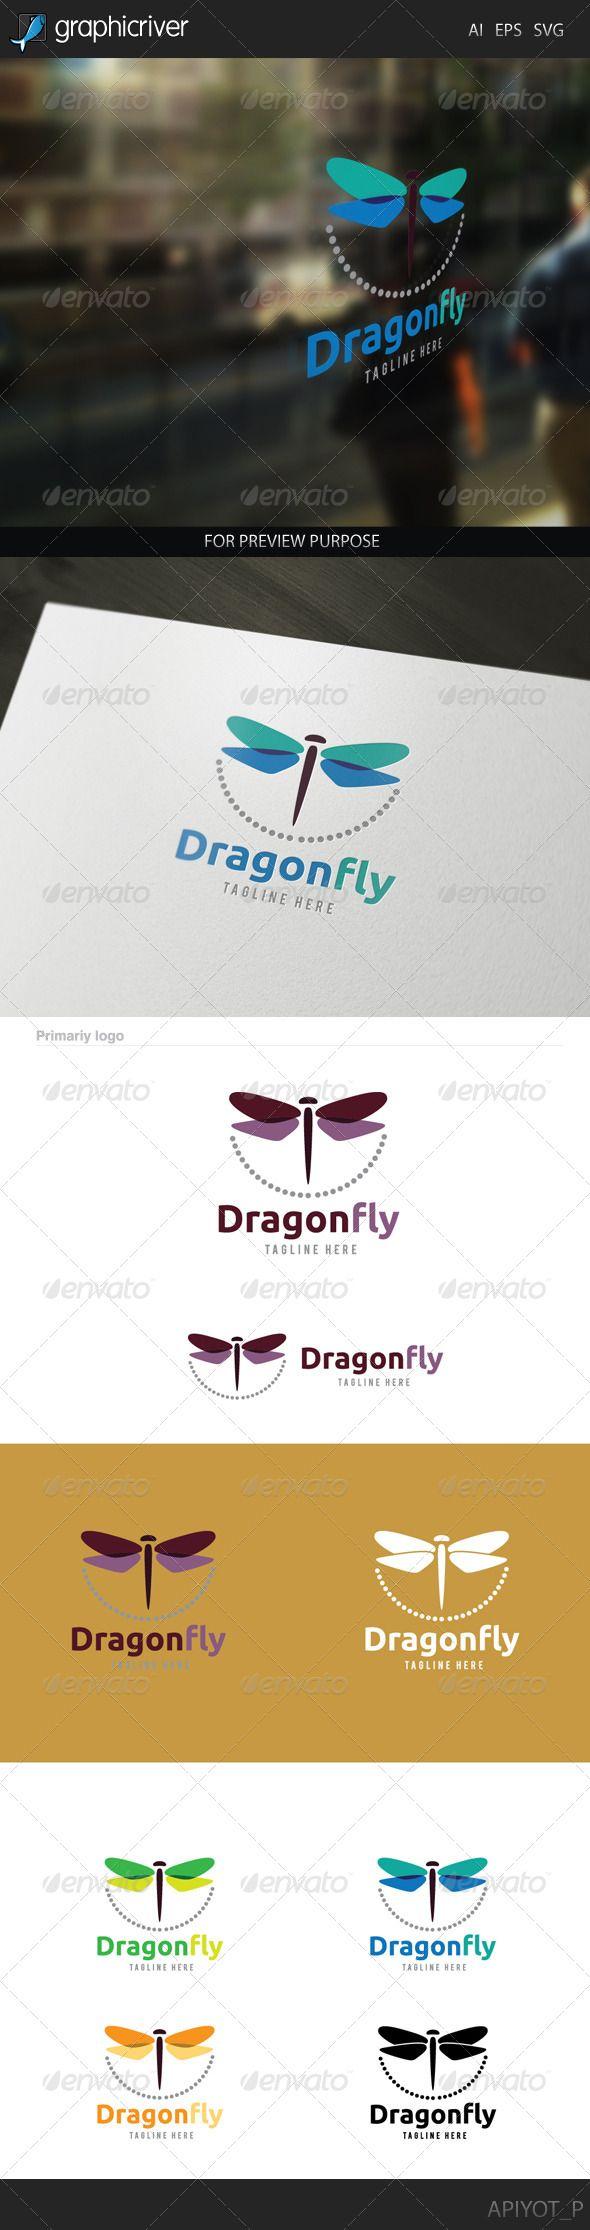 Dragonfly Logo http://graphicriver.net/item/dragonfly-logo/8172879?ref=damiamio